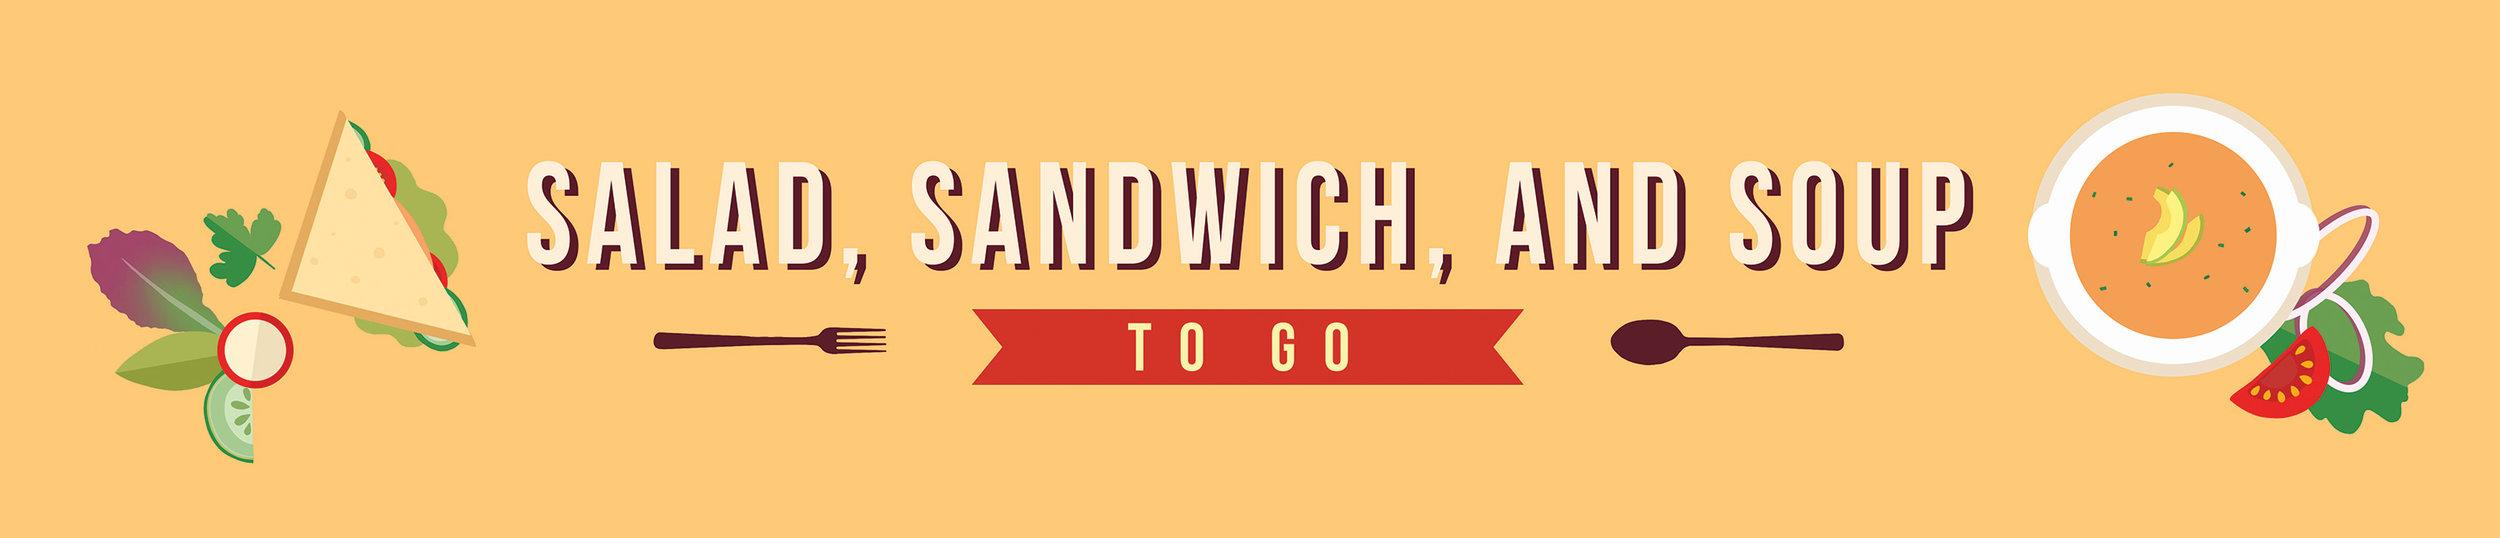 saladsandwichsoup-v1.jpg